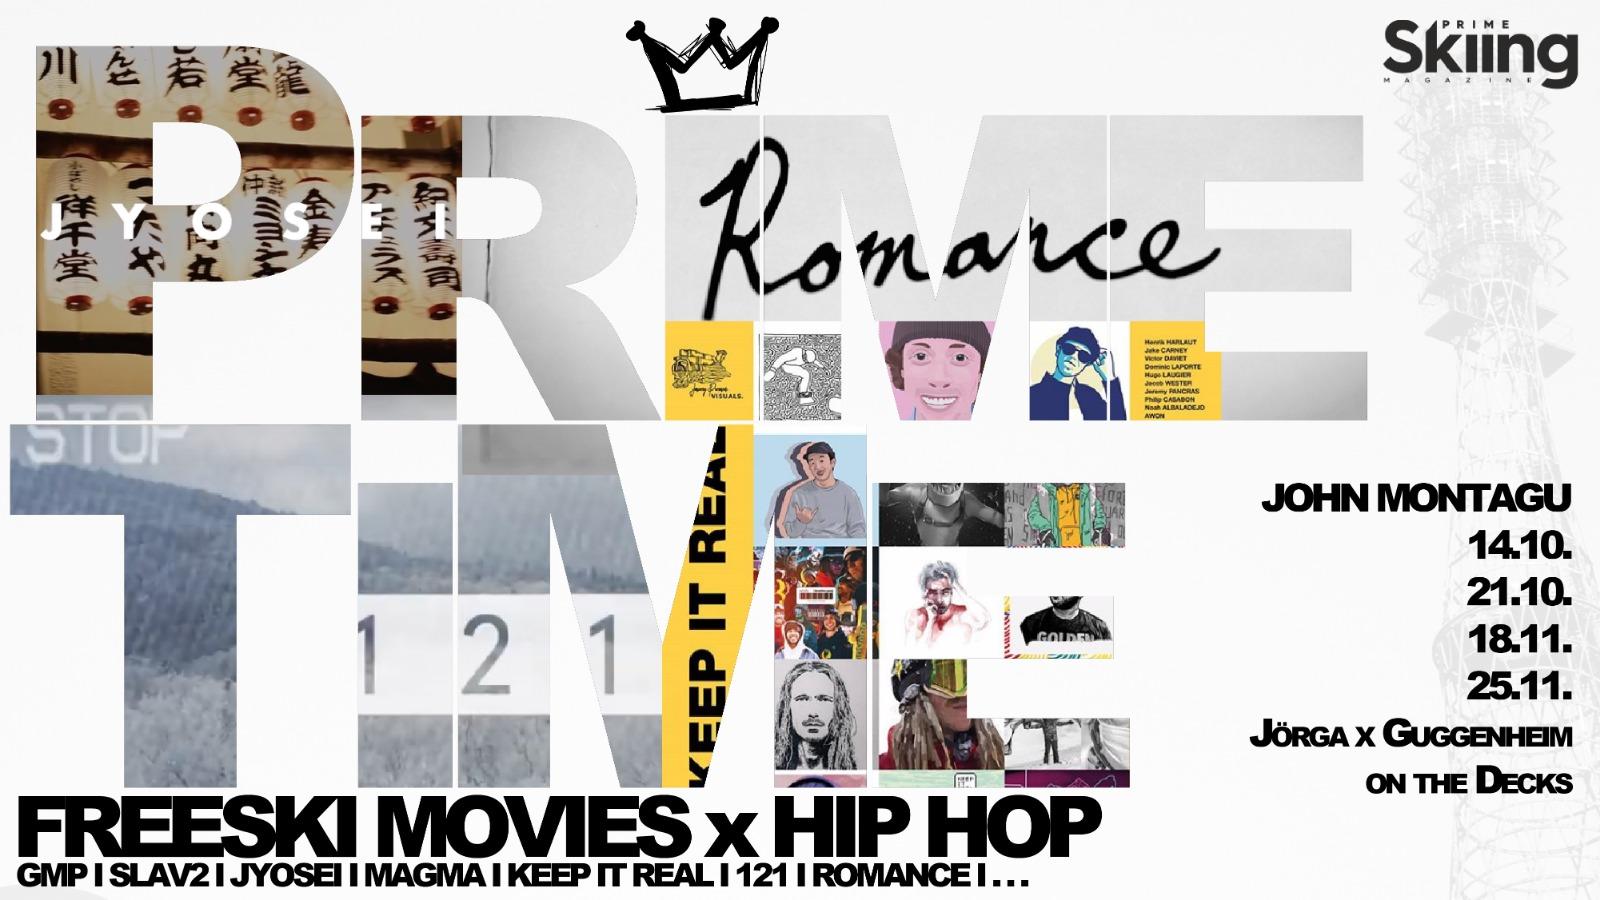 PrimeTime: Freeski Movies & HipHop pt. 3 @ John Montagu, Innsbruck | Innsbruck | Tirol | Österreich